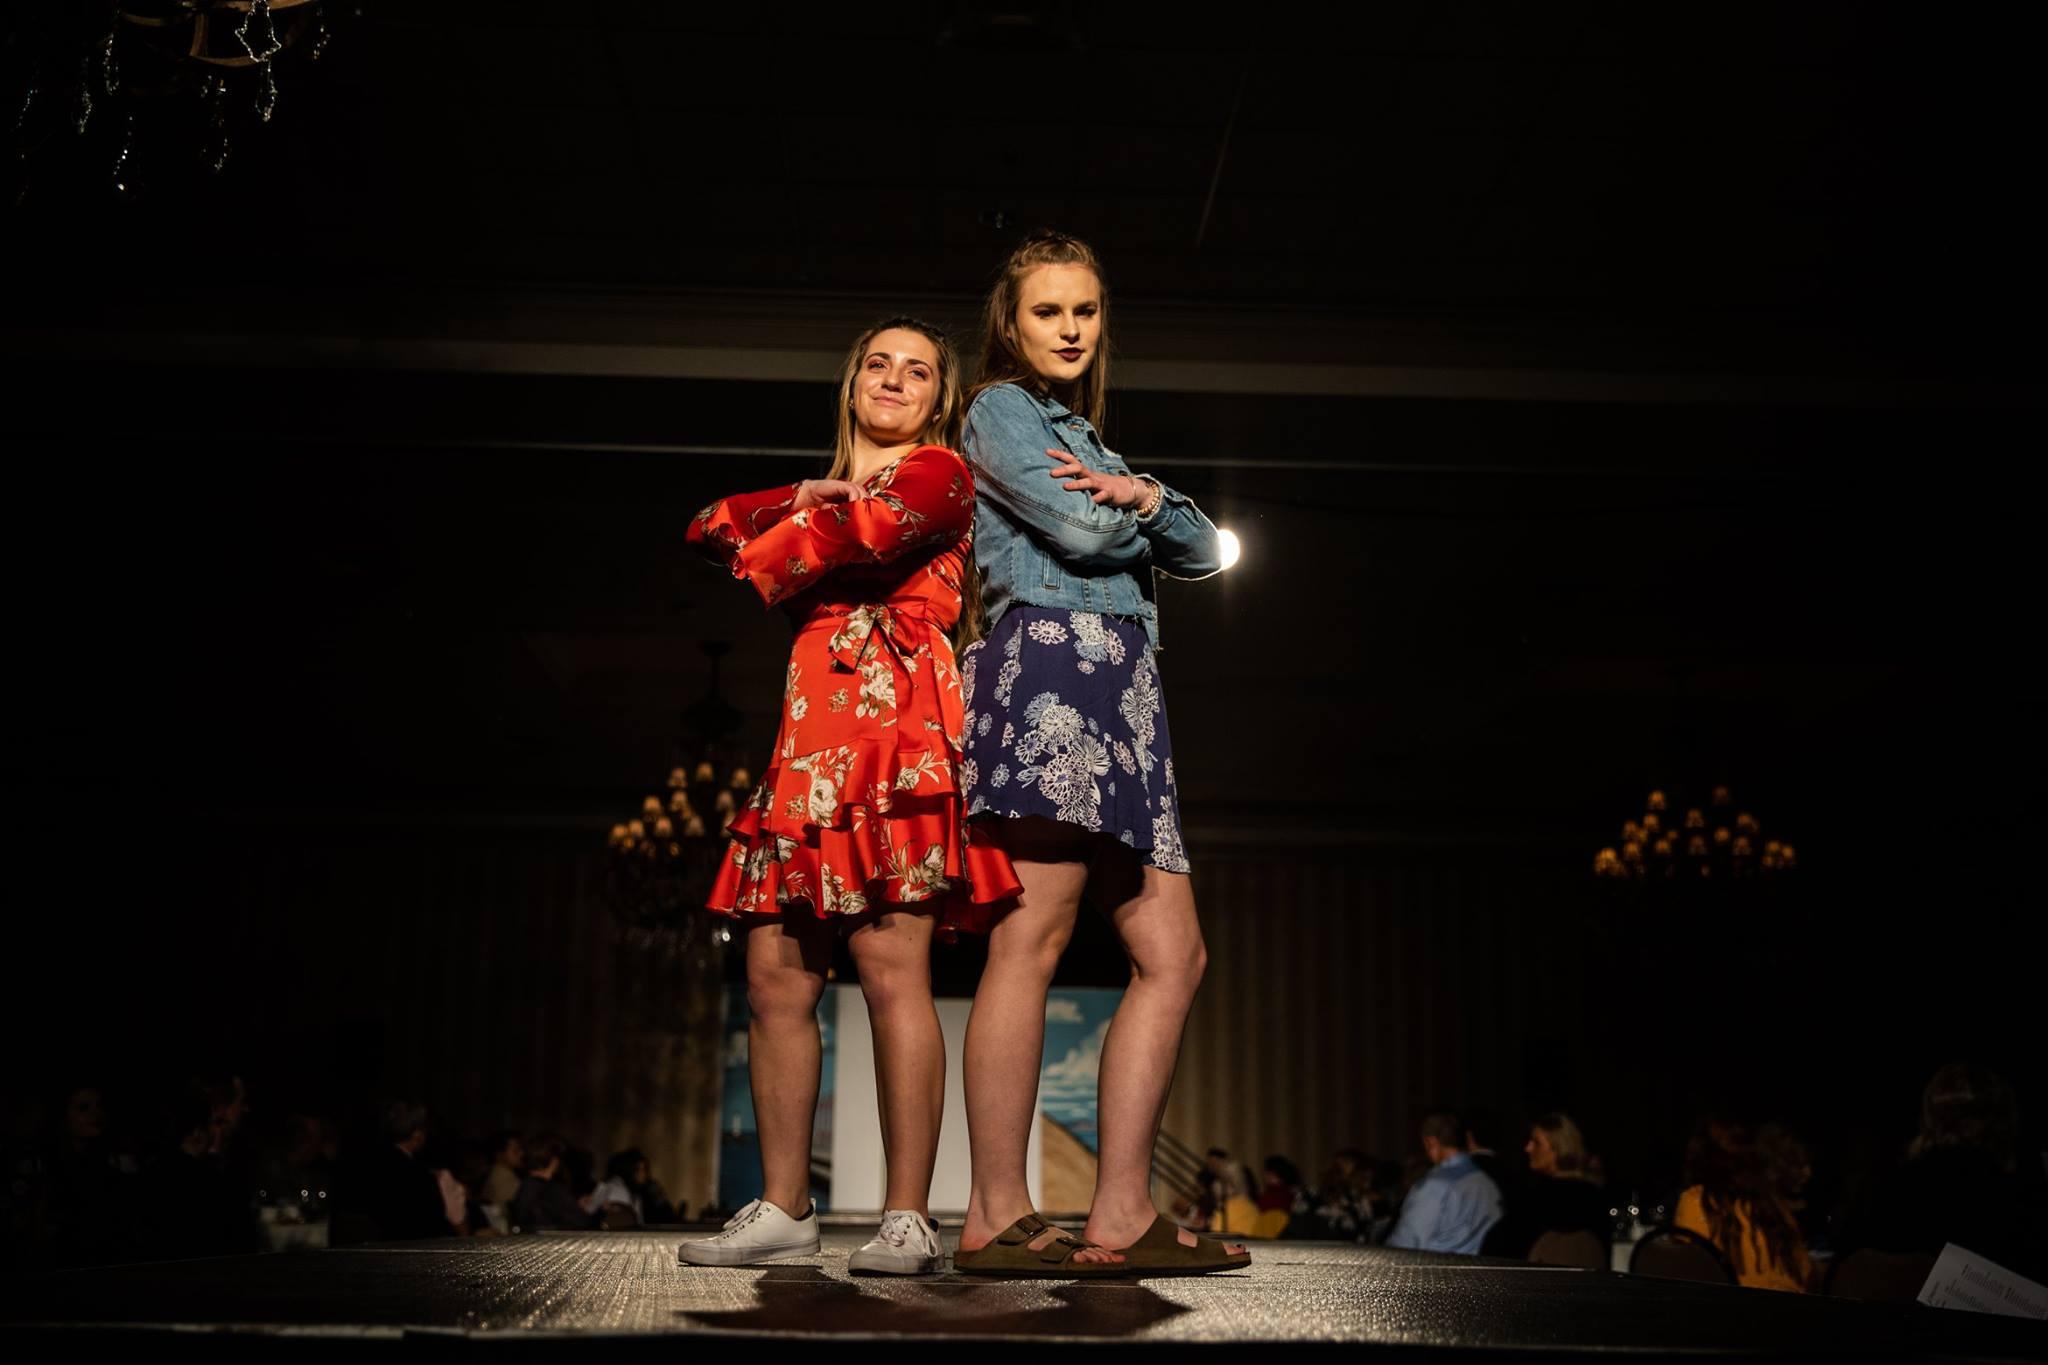 Lutheran_North_High_School_Macomb_Michigan_LHN_Fashion_Show_2019 (15).jpg